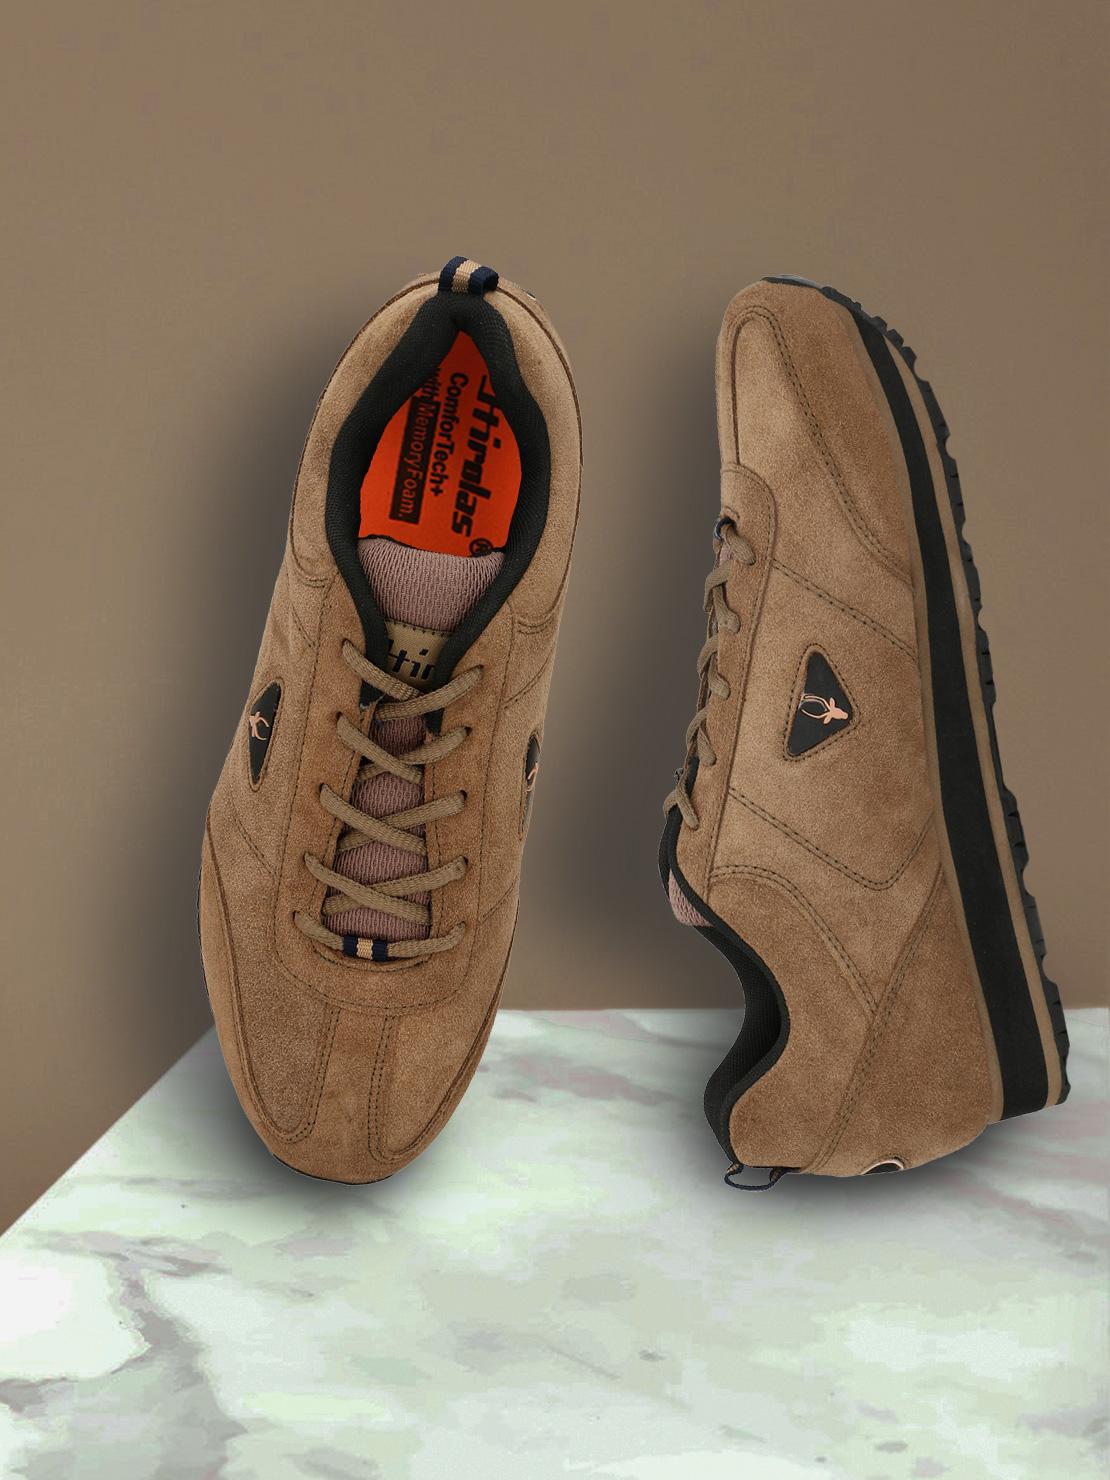 Hirolas   Hirolas Leather Multi Sport Shock Absorbing Walking  Running Fitness Athletic Training Gym Sneaker Shoes - Camel